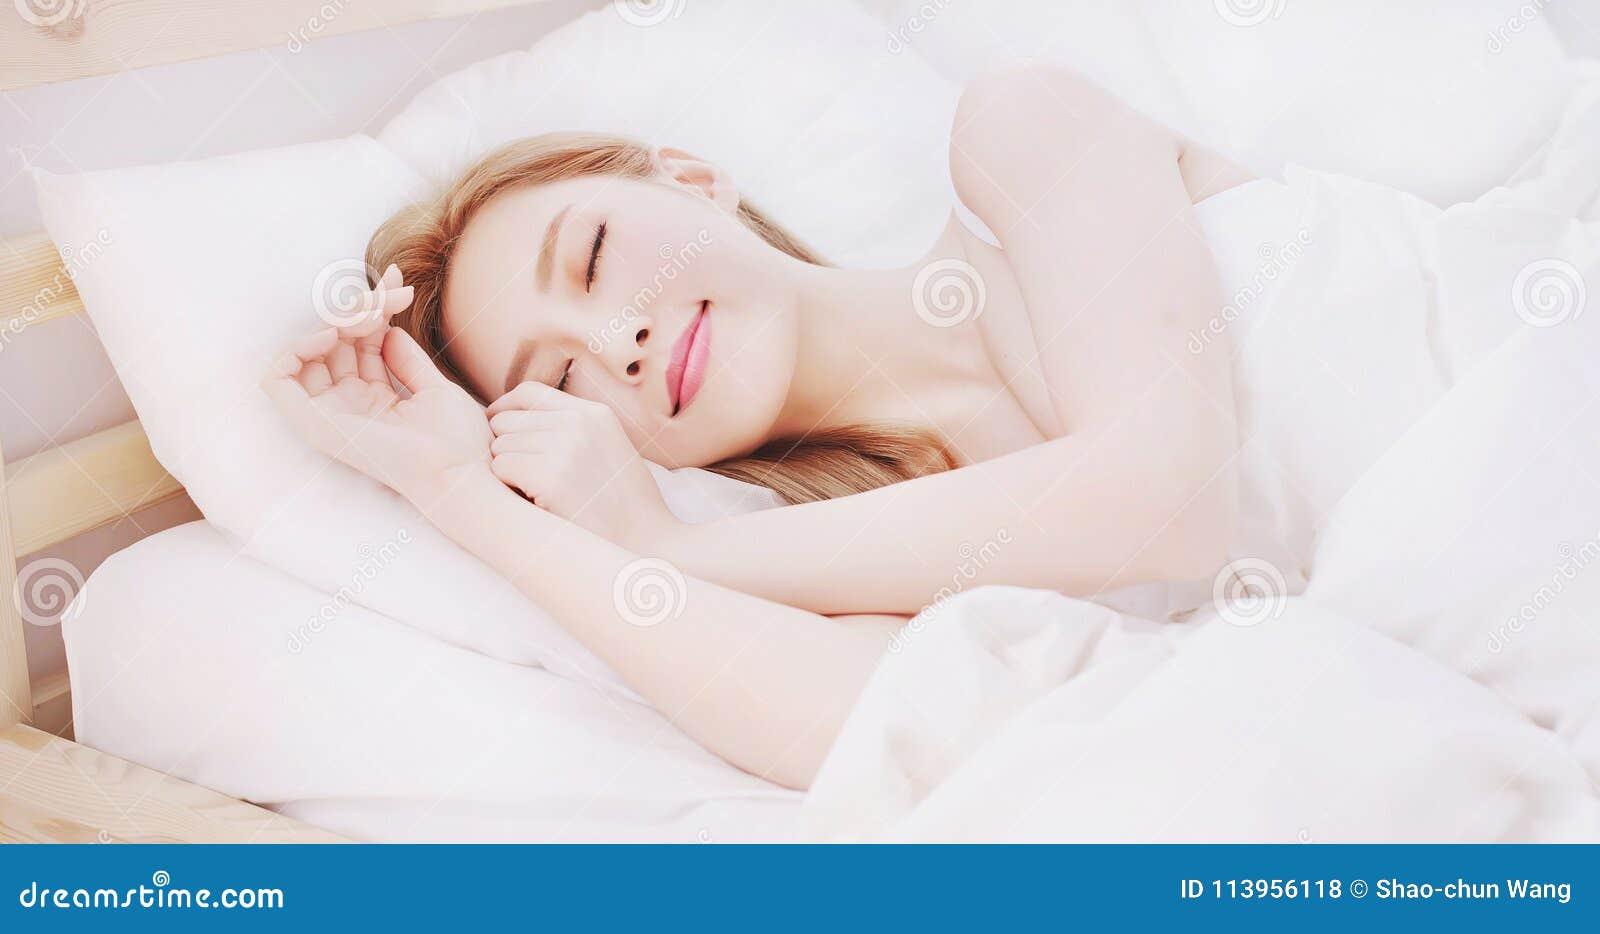 Сладкий Сон Студентки